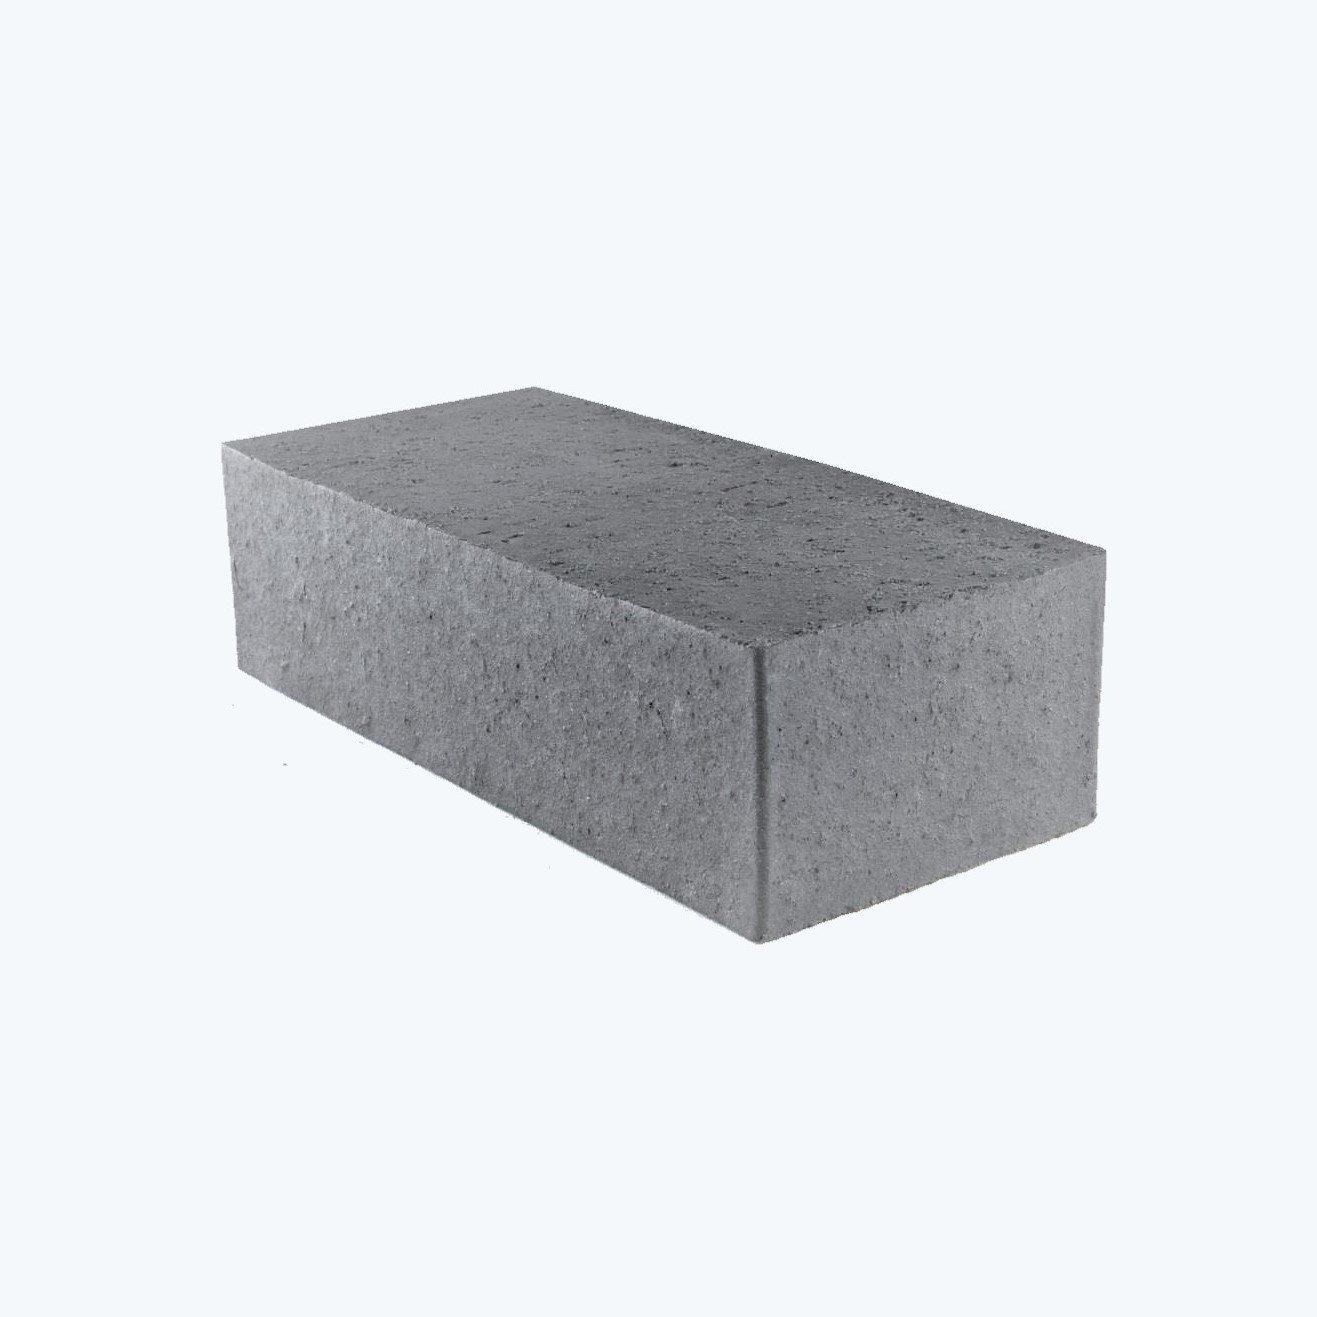 65mm Wienerberger Class A Engineering Brick - BLUE (Solid Type)